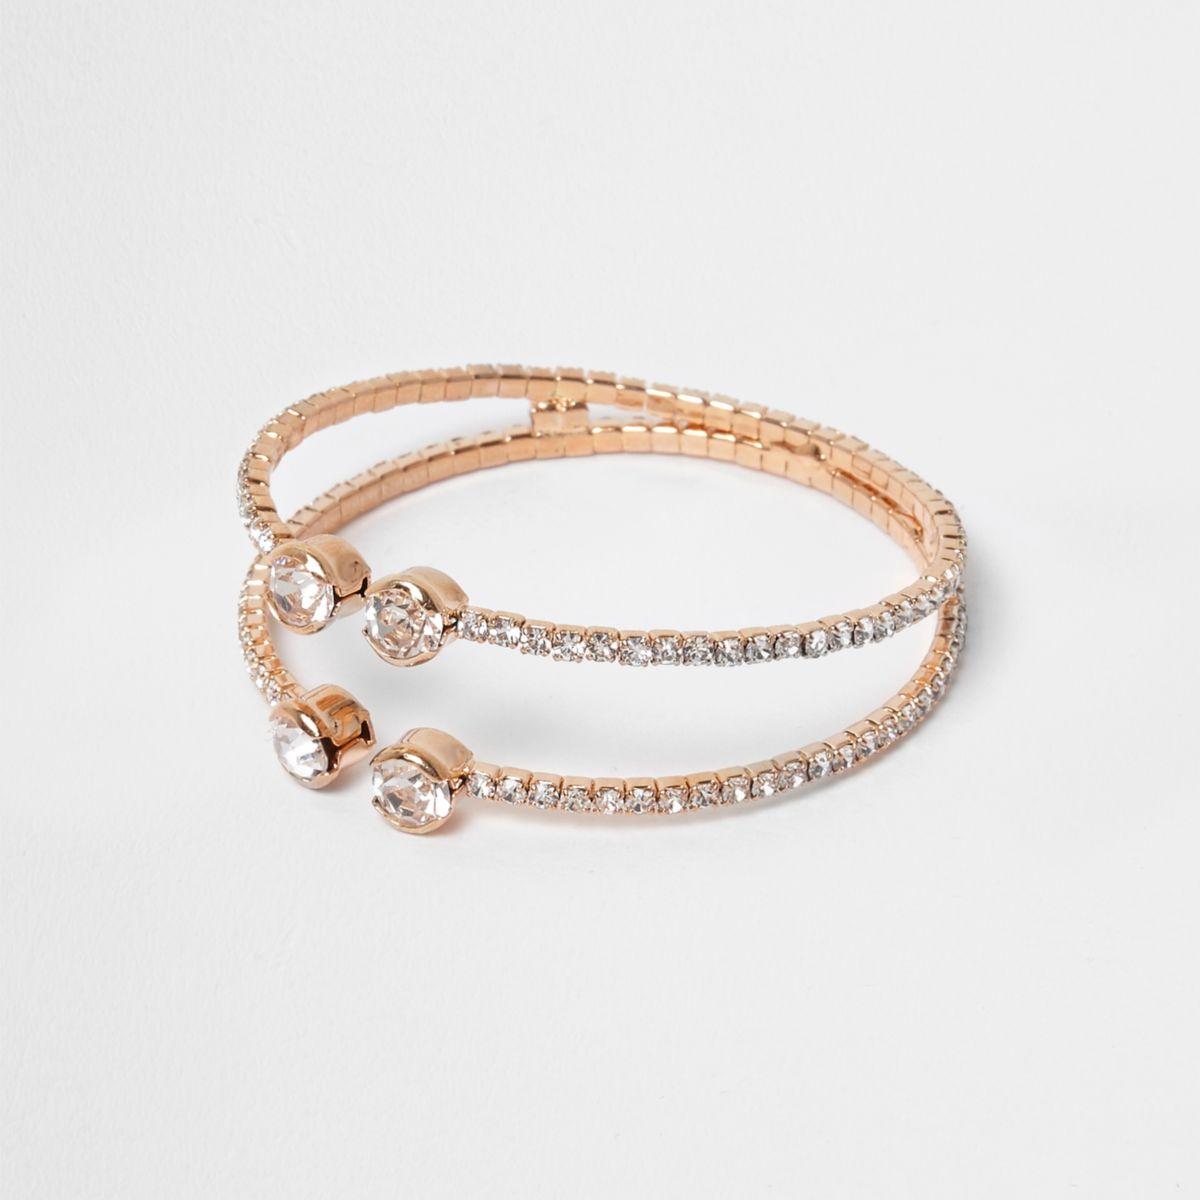 Rose gold tone diamante pave cuff bracelet